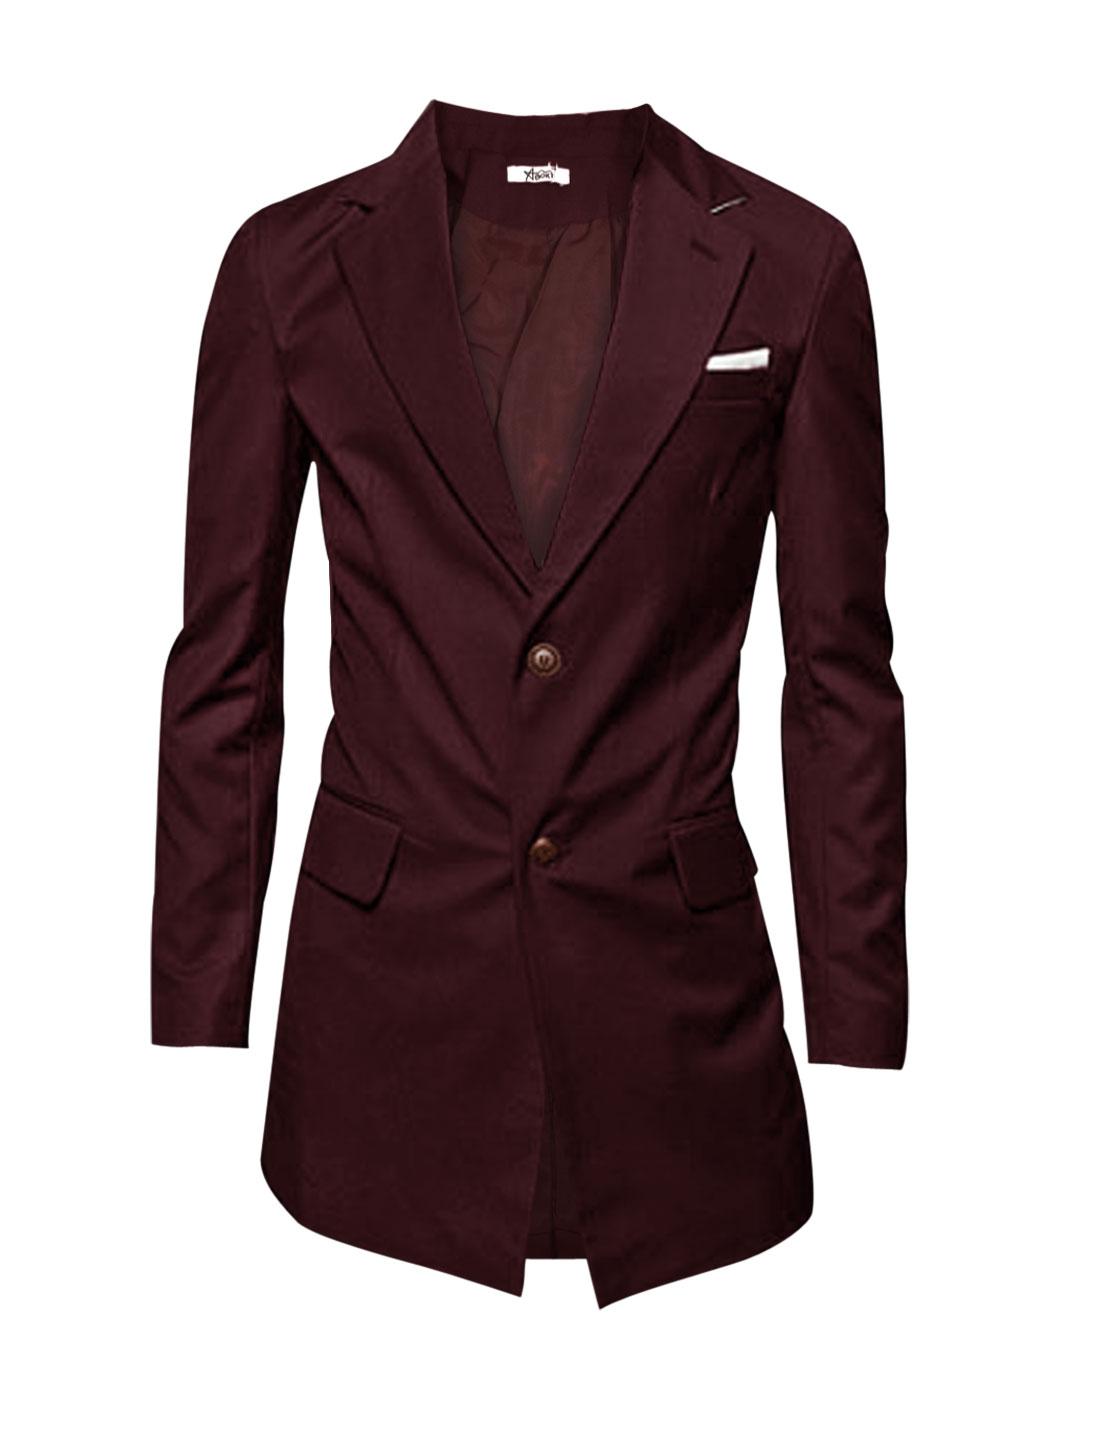 Men Long Sleeve Buttoned Cuffs Fake Pocket Cozy Fit Blazer Jacket Burgundy L